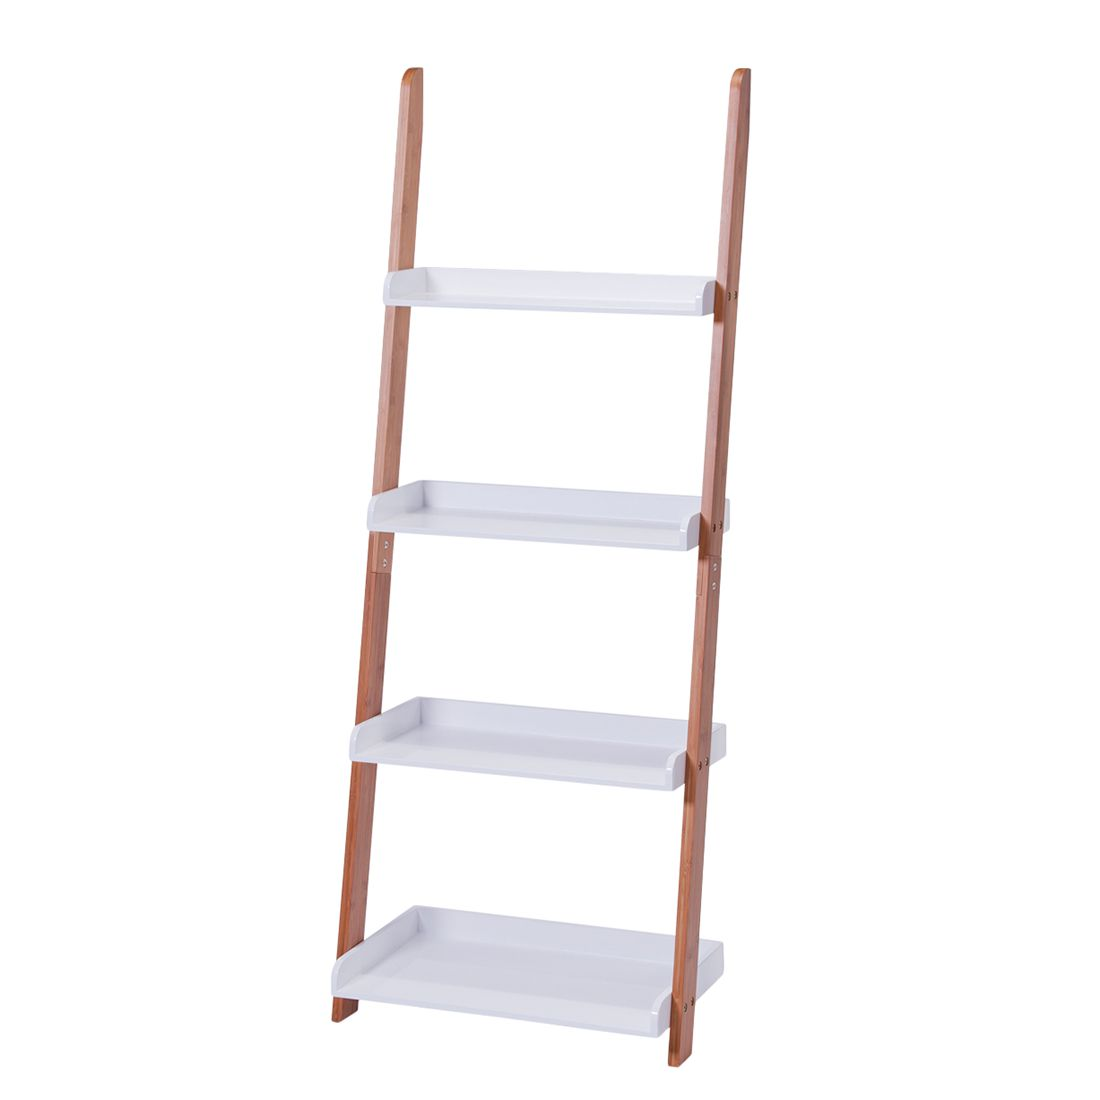 Regal Alvin III – Bambus/Weiß – lackiert, Zeller online kaufen